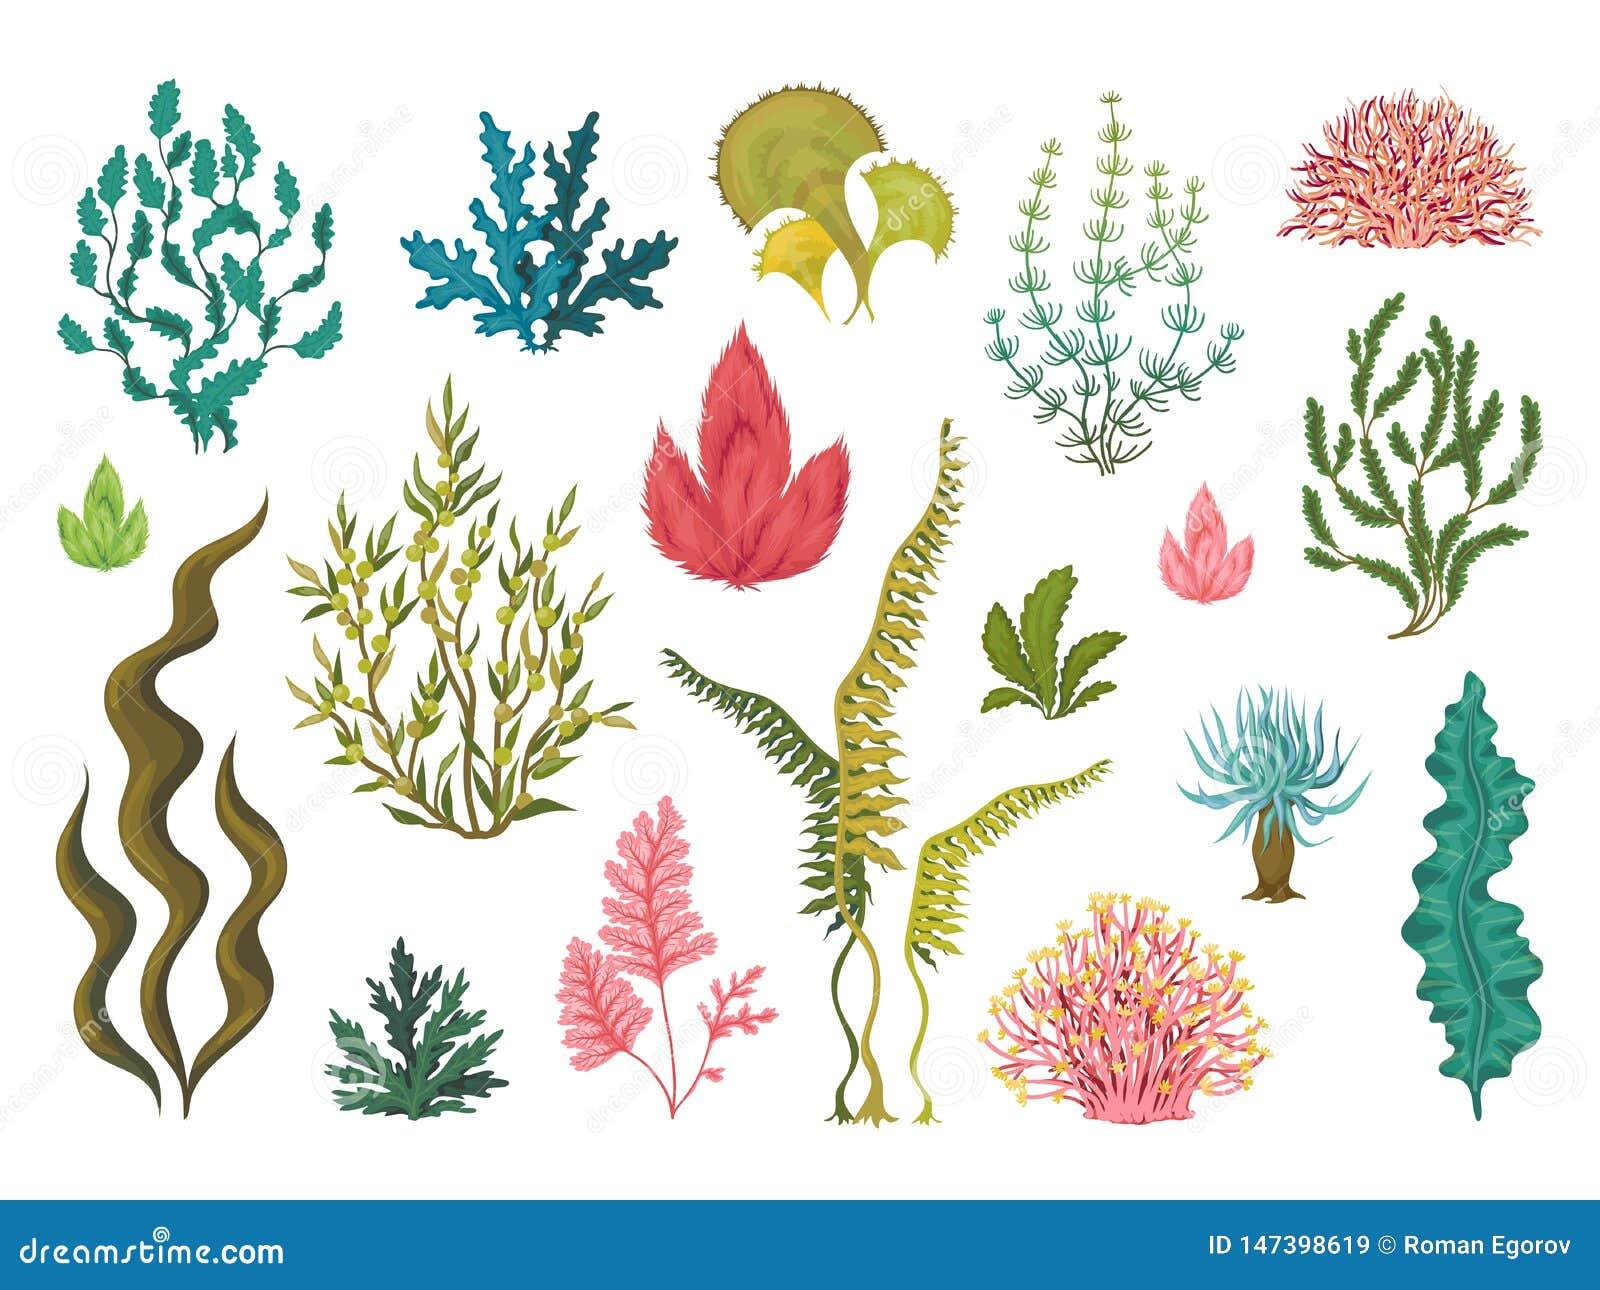 Seaweeds Underwater Ocean Plants Sea Coral Elements Hand Drawn Ocean Flourish Algae Cartoon Decorative Drawing Stock Vector Illustration Of Hand Elements 147398619